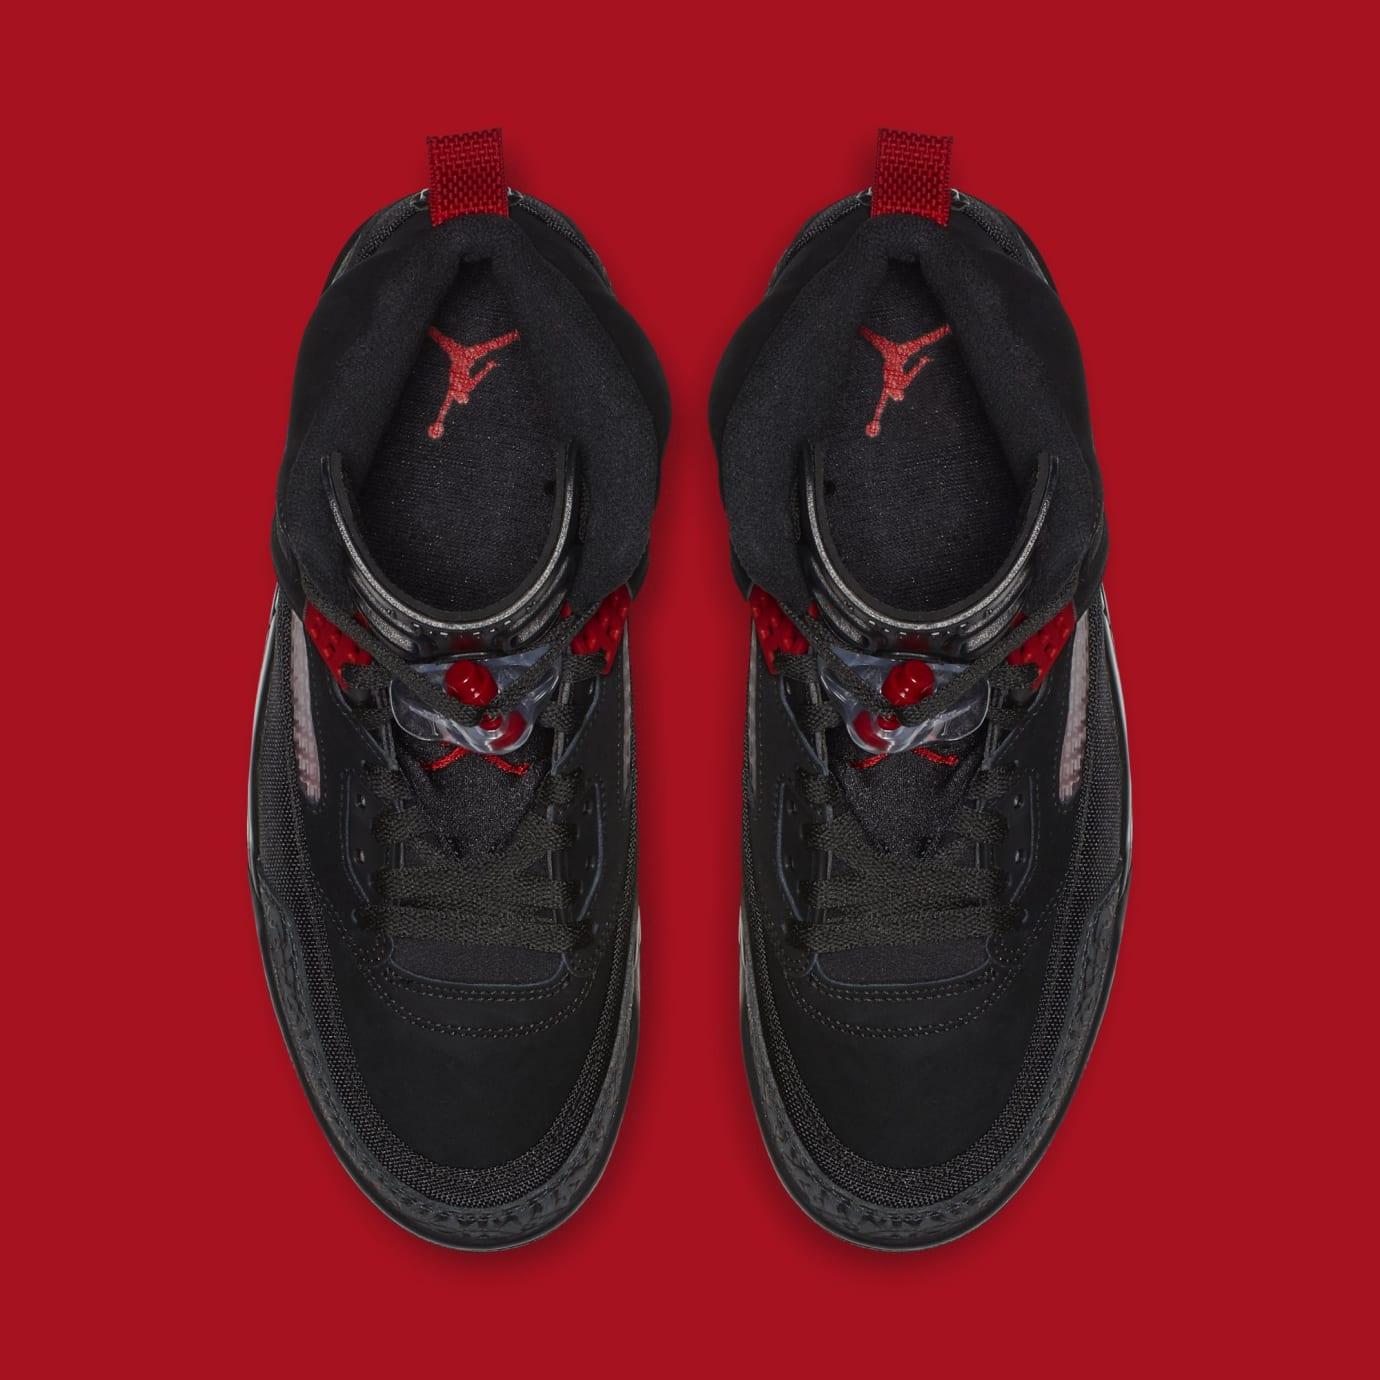 fb1fb0b6f9c2dc Jordan Spizike  Black Anthracite-Gym Red  315371-006 Release Date ...